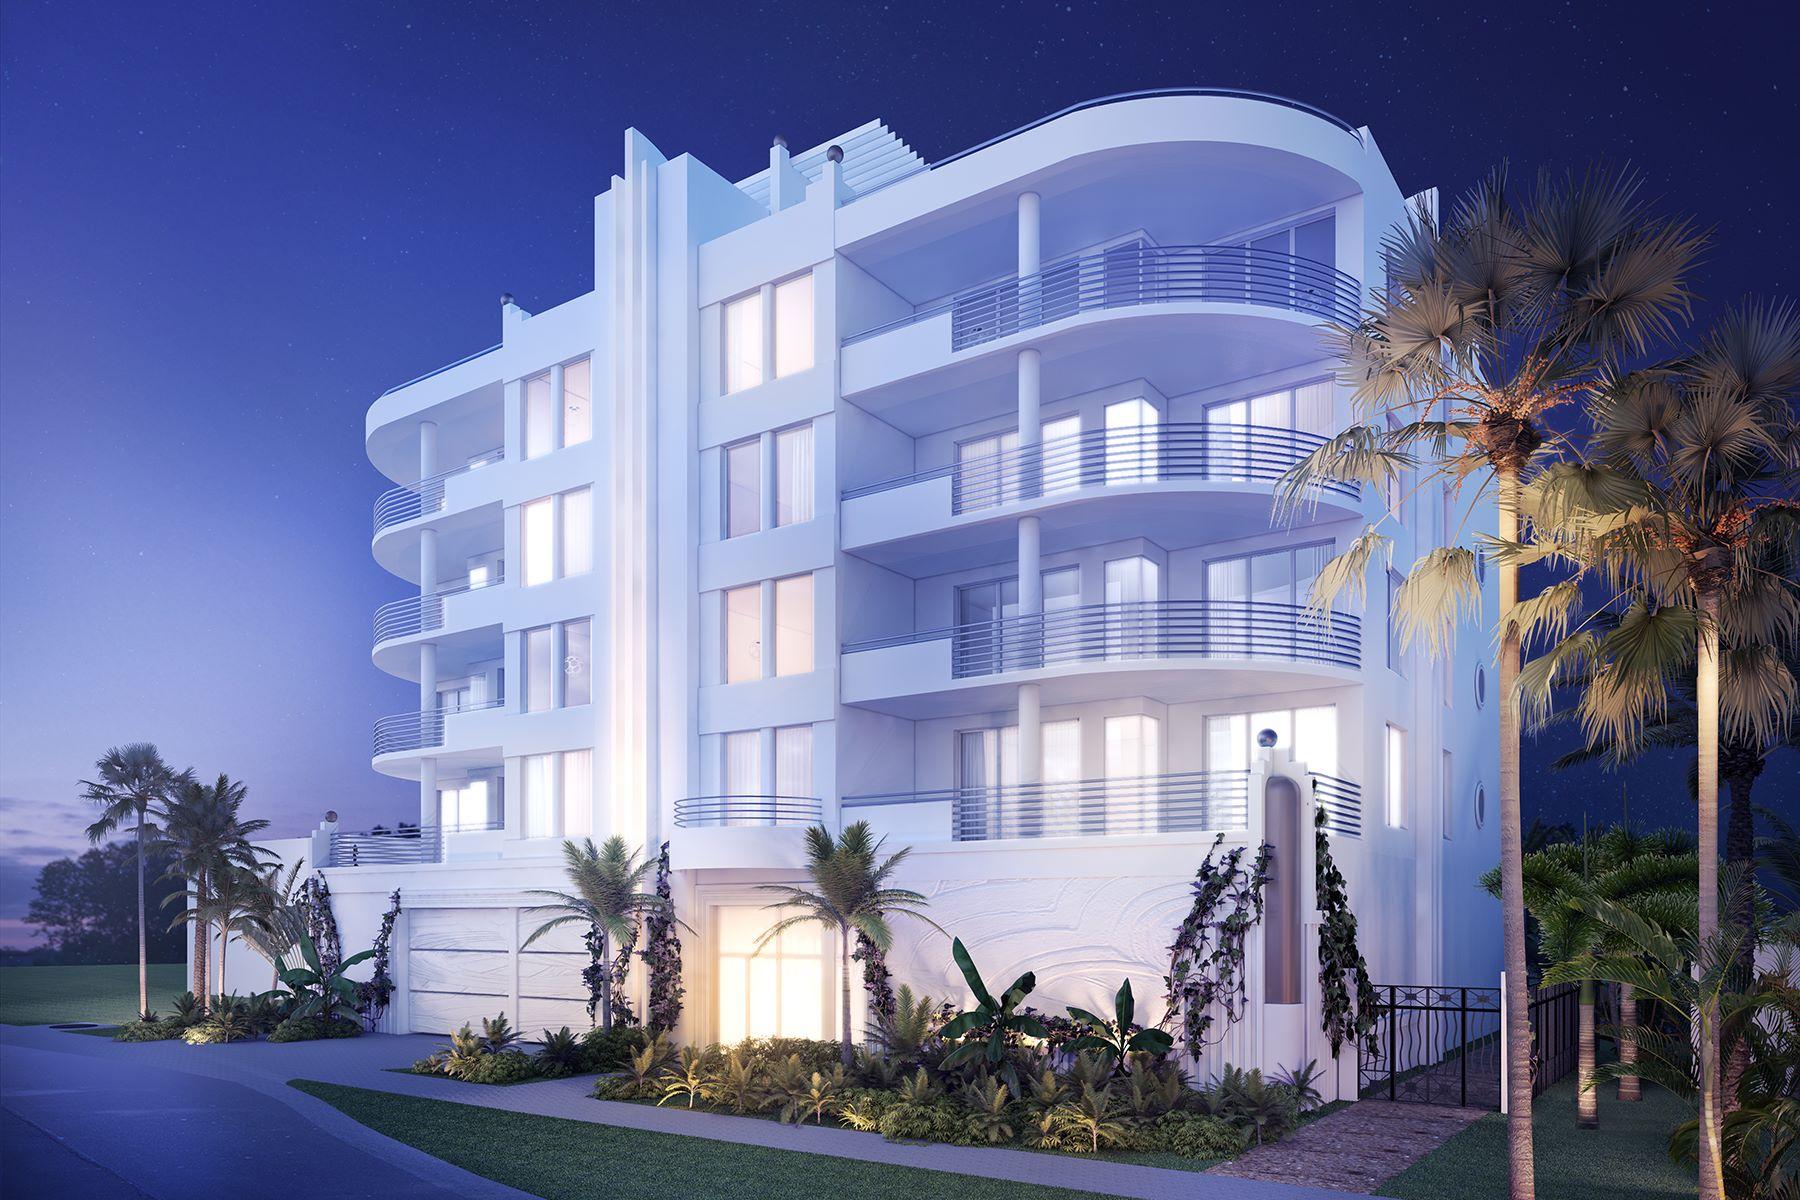 Condominium for Sale at GOLDEN GATE POINT 609 Golden Gate Pt 201 2, Sarasota, Florida 34236 United States